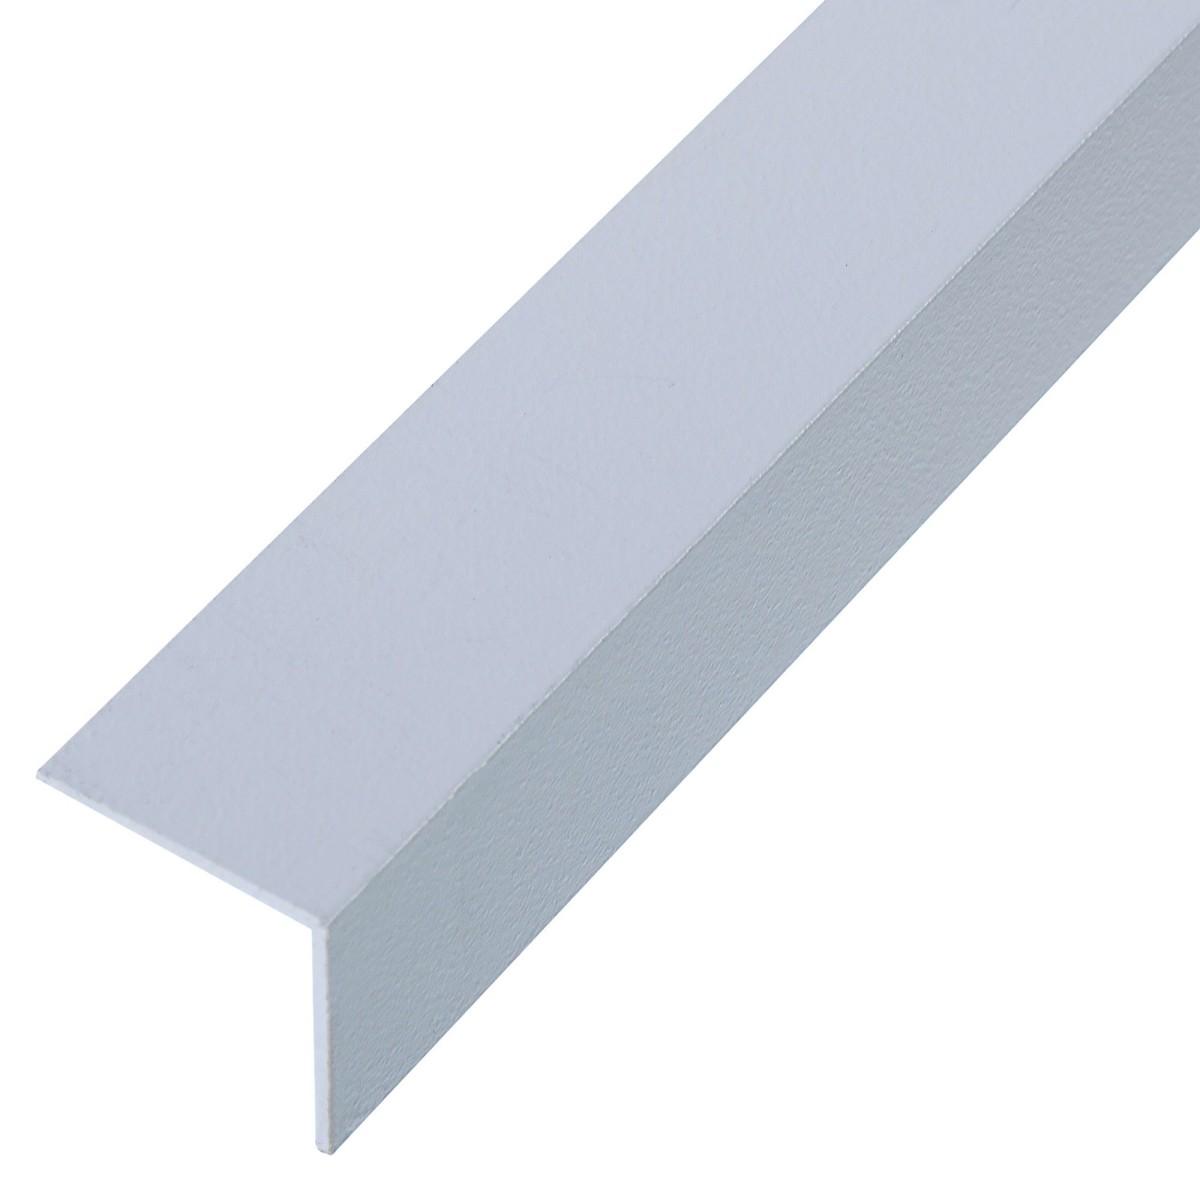 Уголок QuickStick 20x20x1x2000 мм алюминий цвет белый